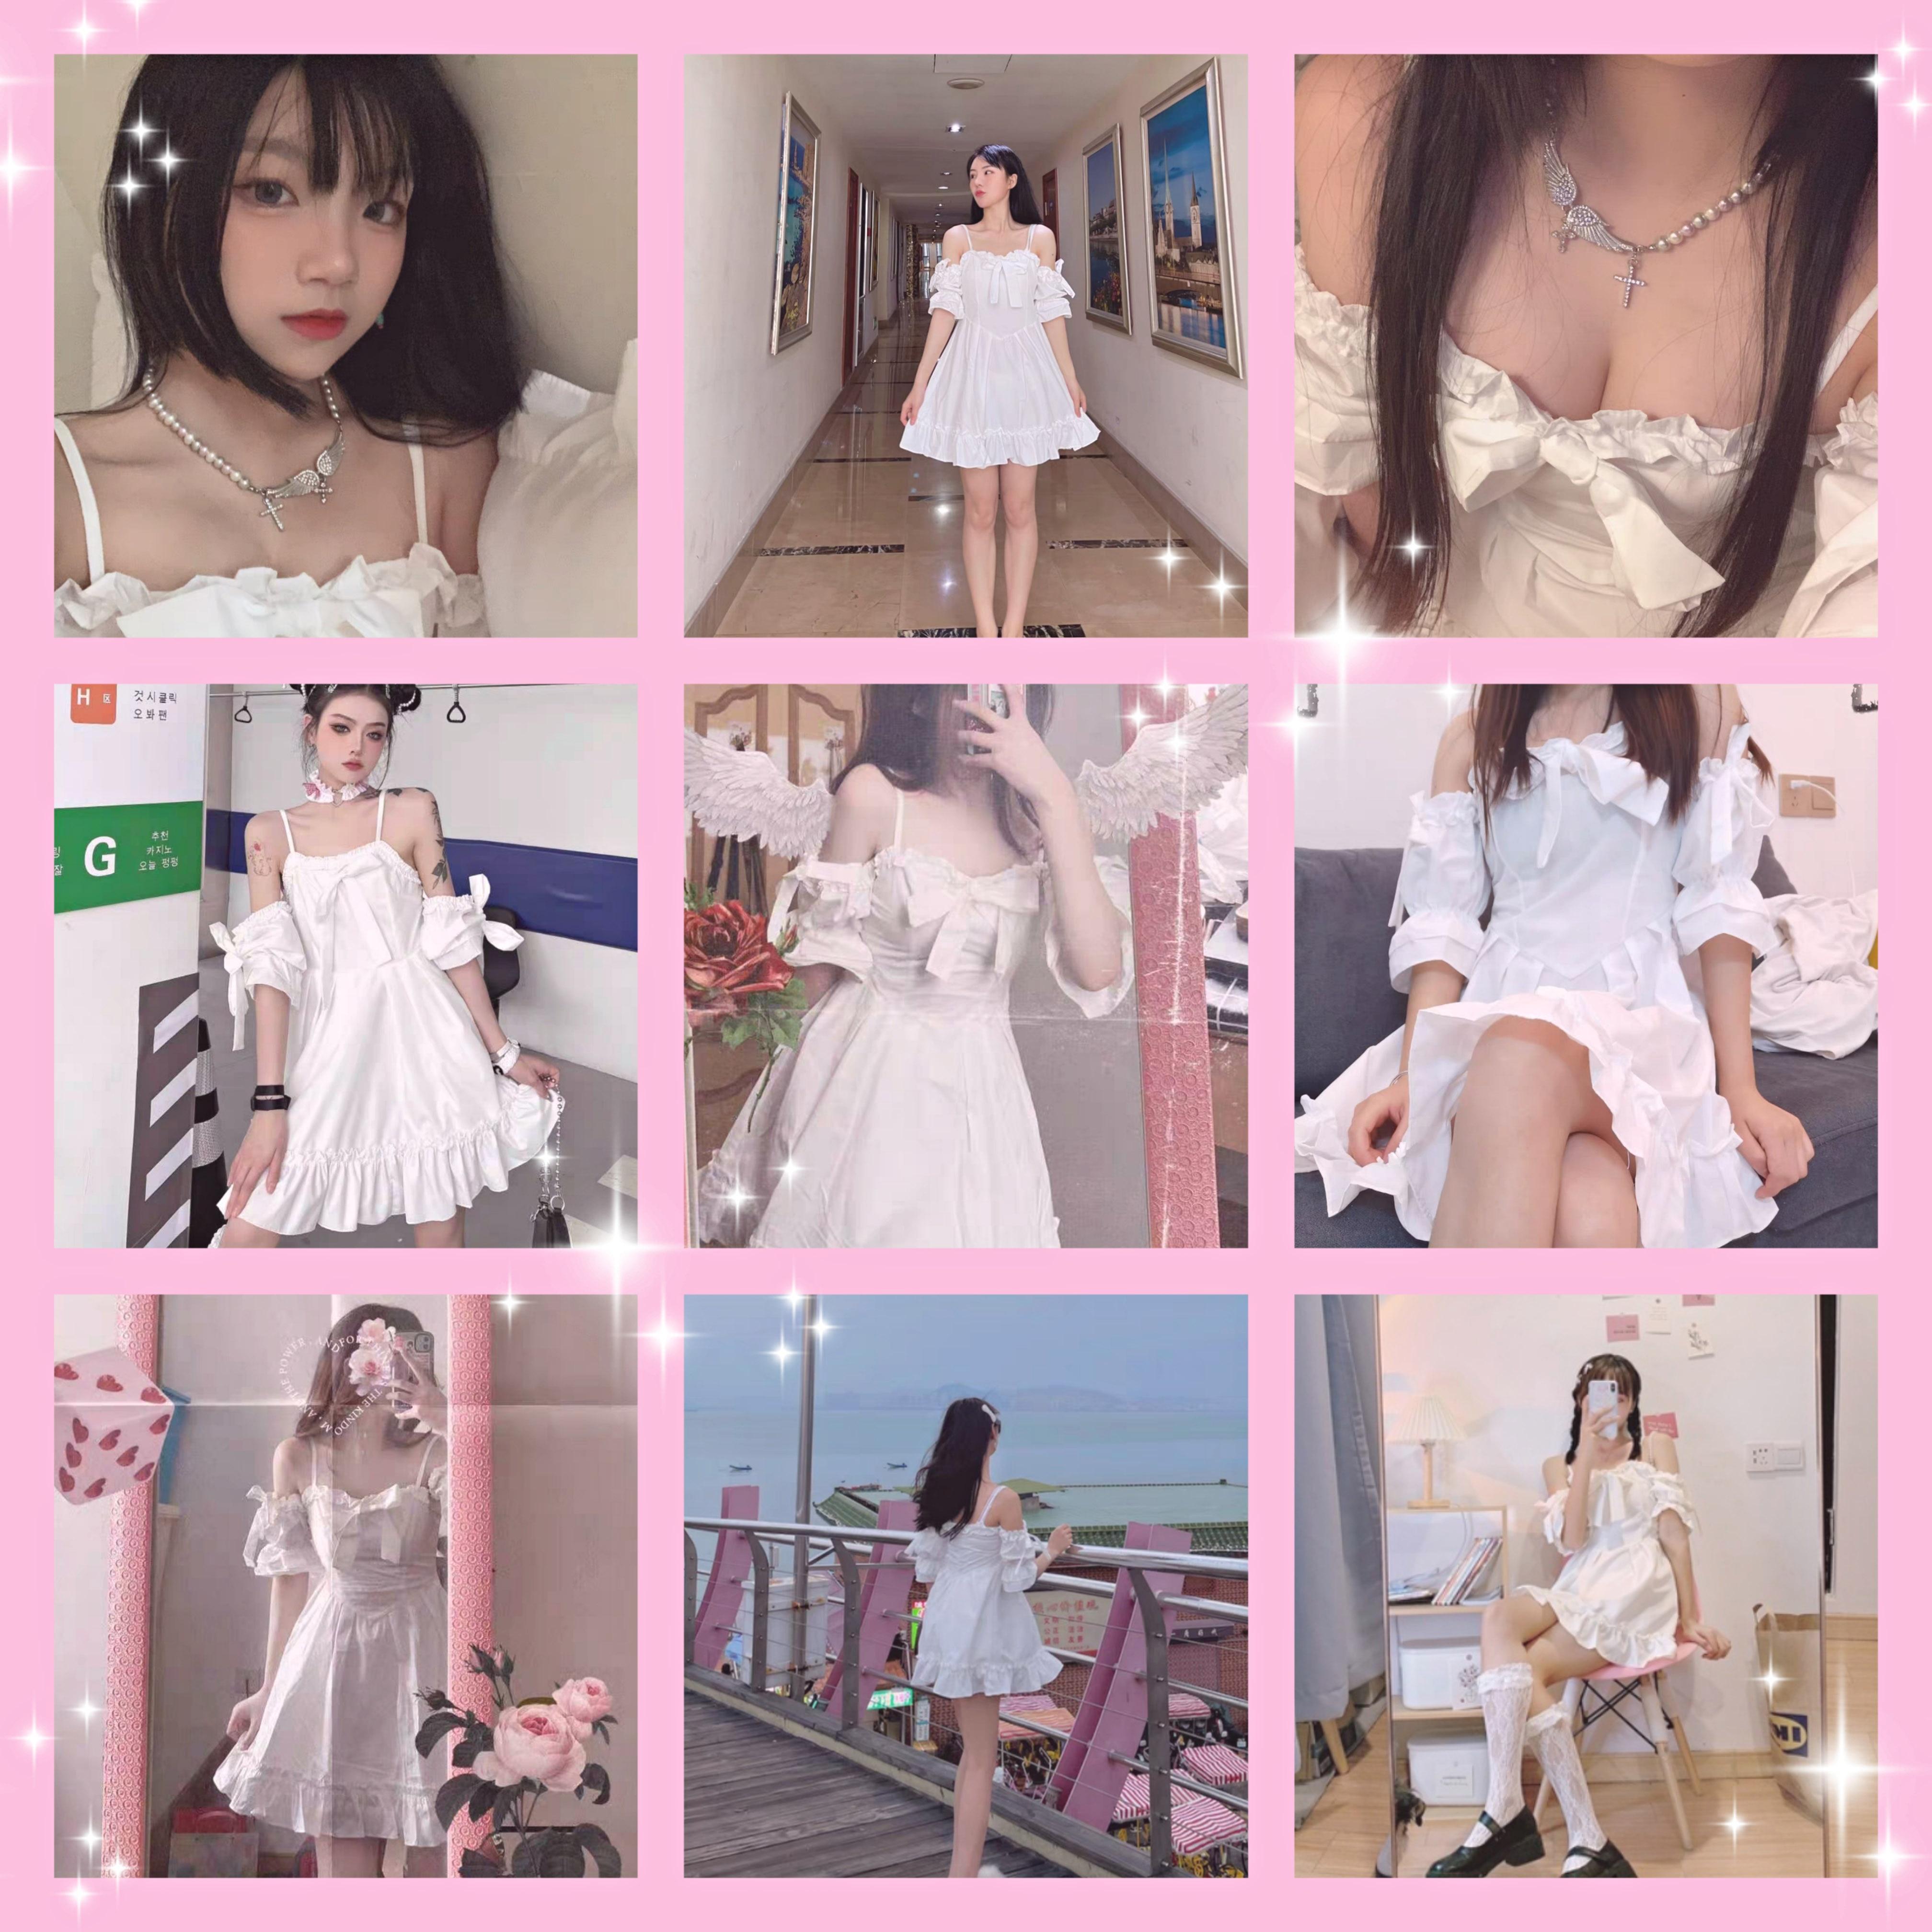 White Kawaii Fairy Strap Dress Women Patchwork Off Shoulder Sexy Party Mini Dresses Bow Ruffle Sweet Cute Princess Sundress 2021